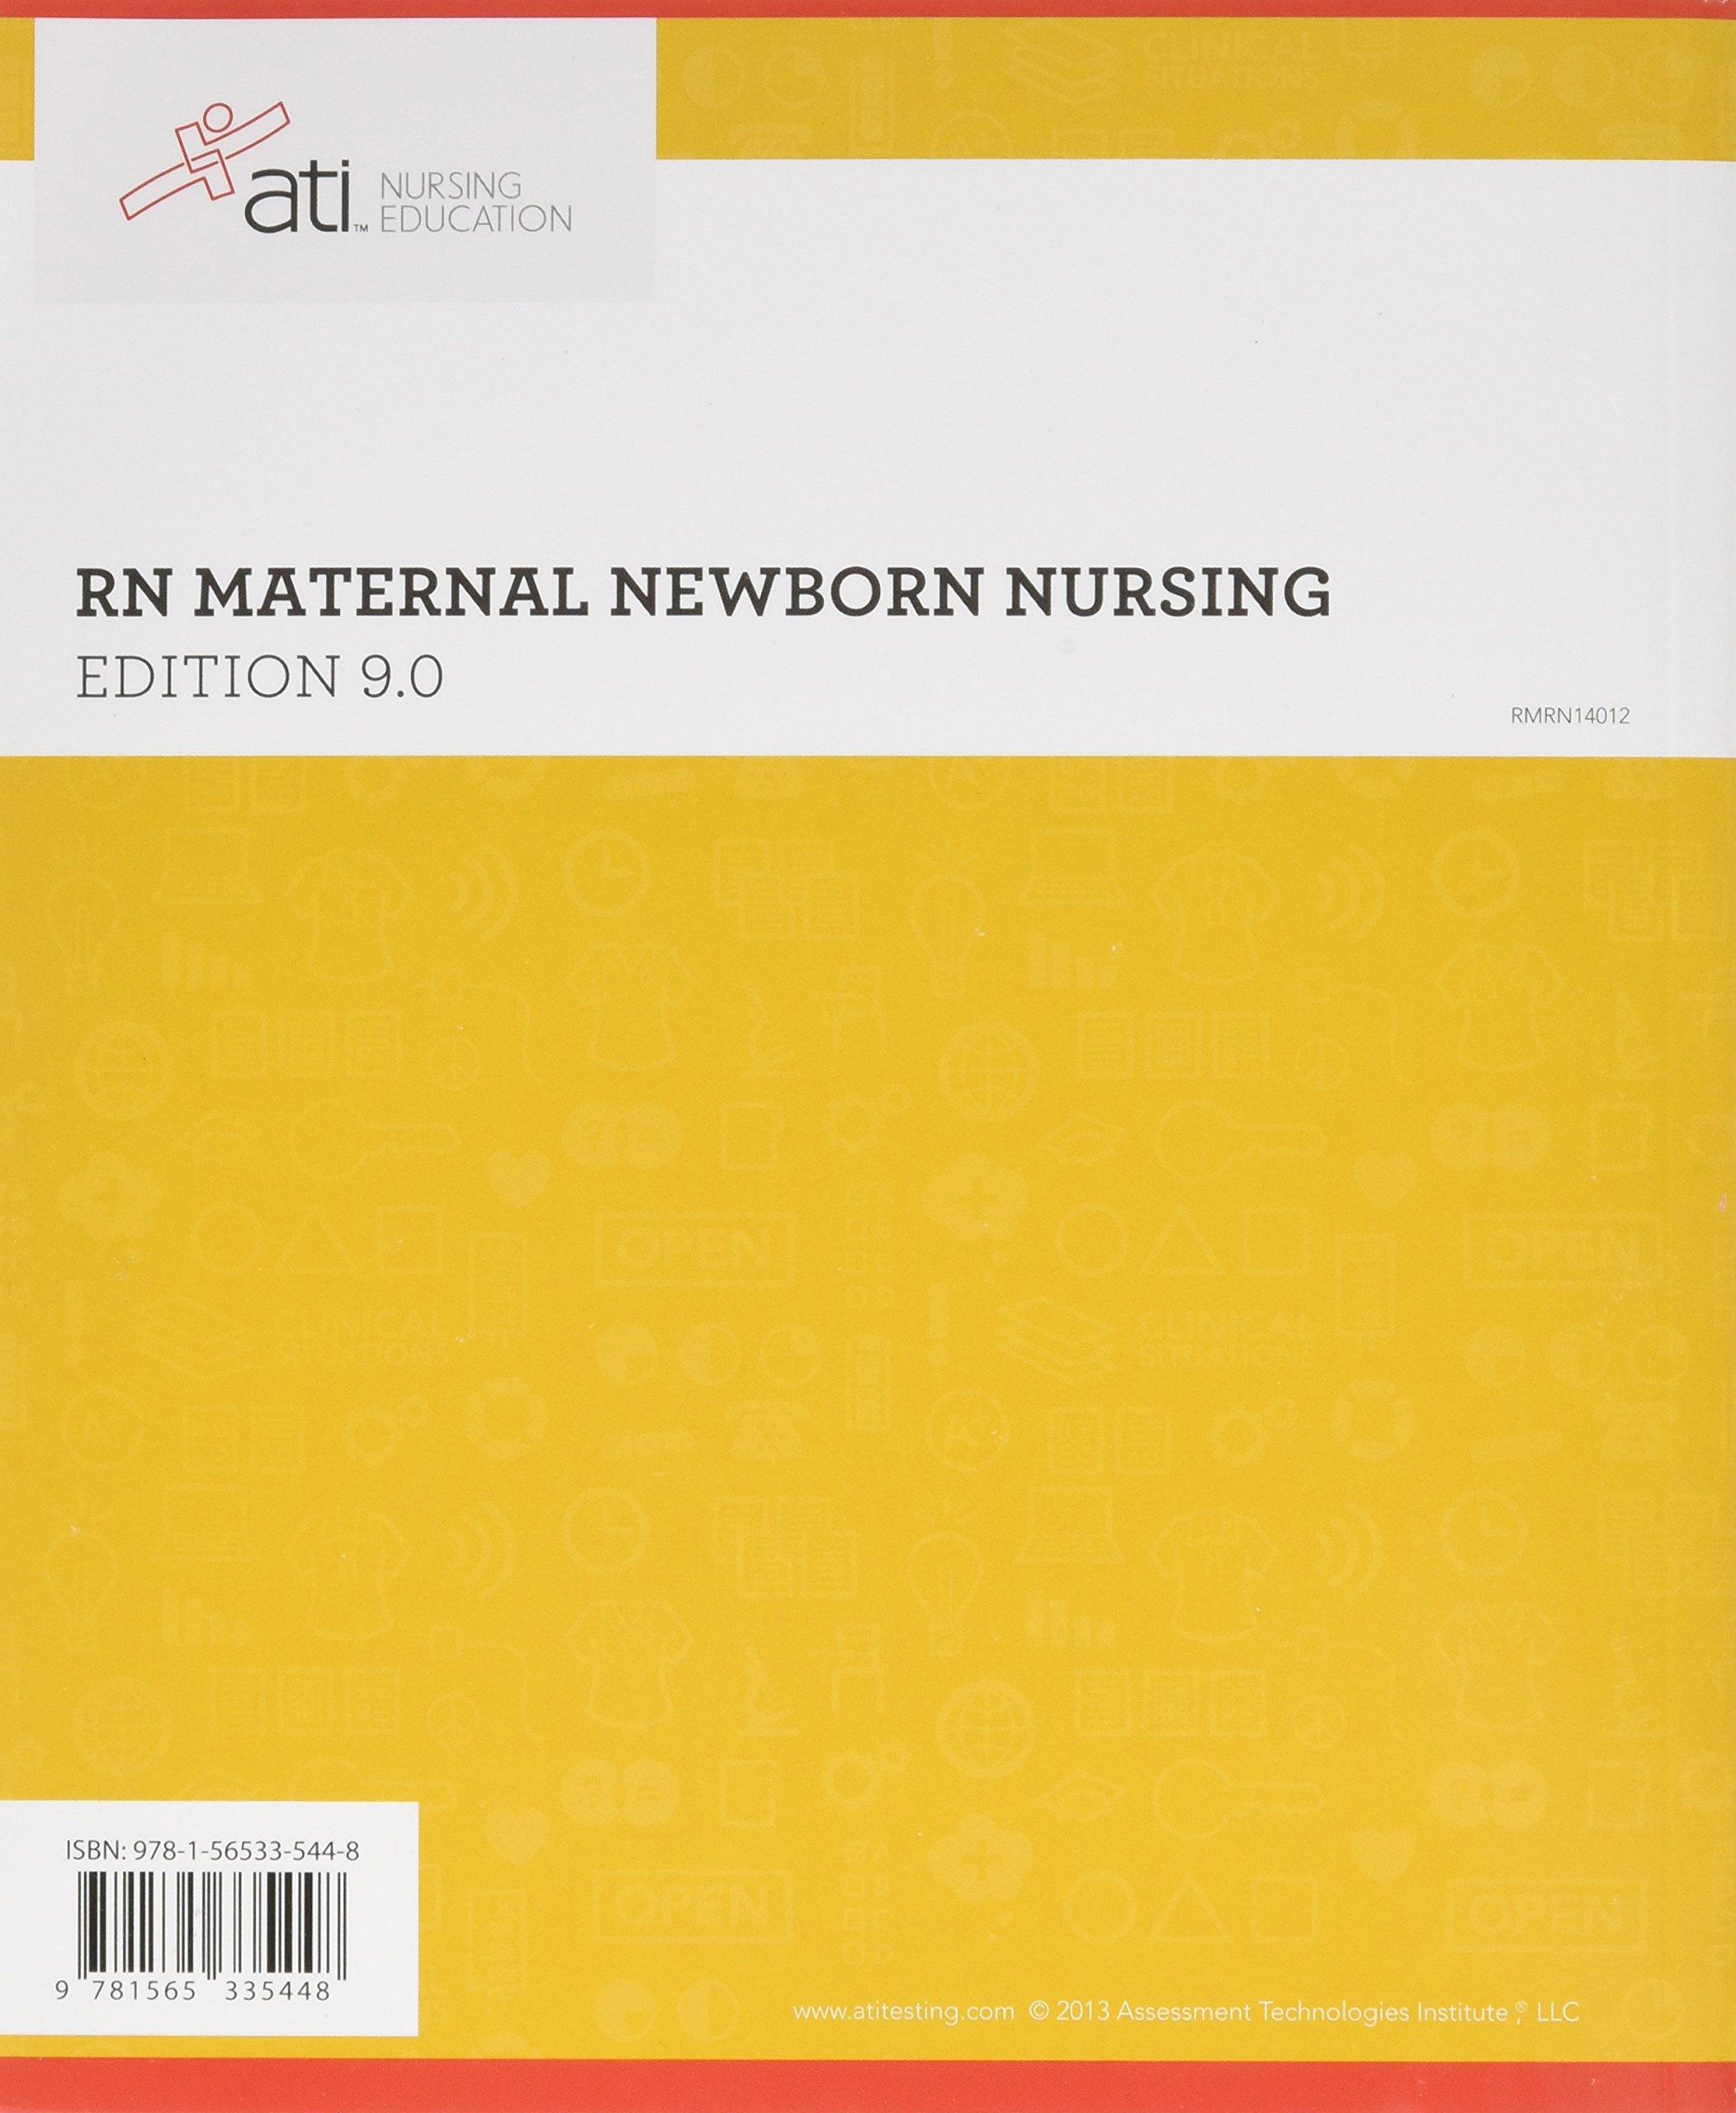 68481afd0470a RN Maternal Newborn Nursing Edition 9. 0: Roberts, Redding, Churchill  Sommer Johnson: 9781565335448: Amazon.com: Books